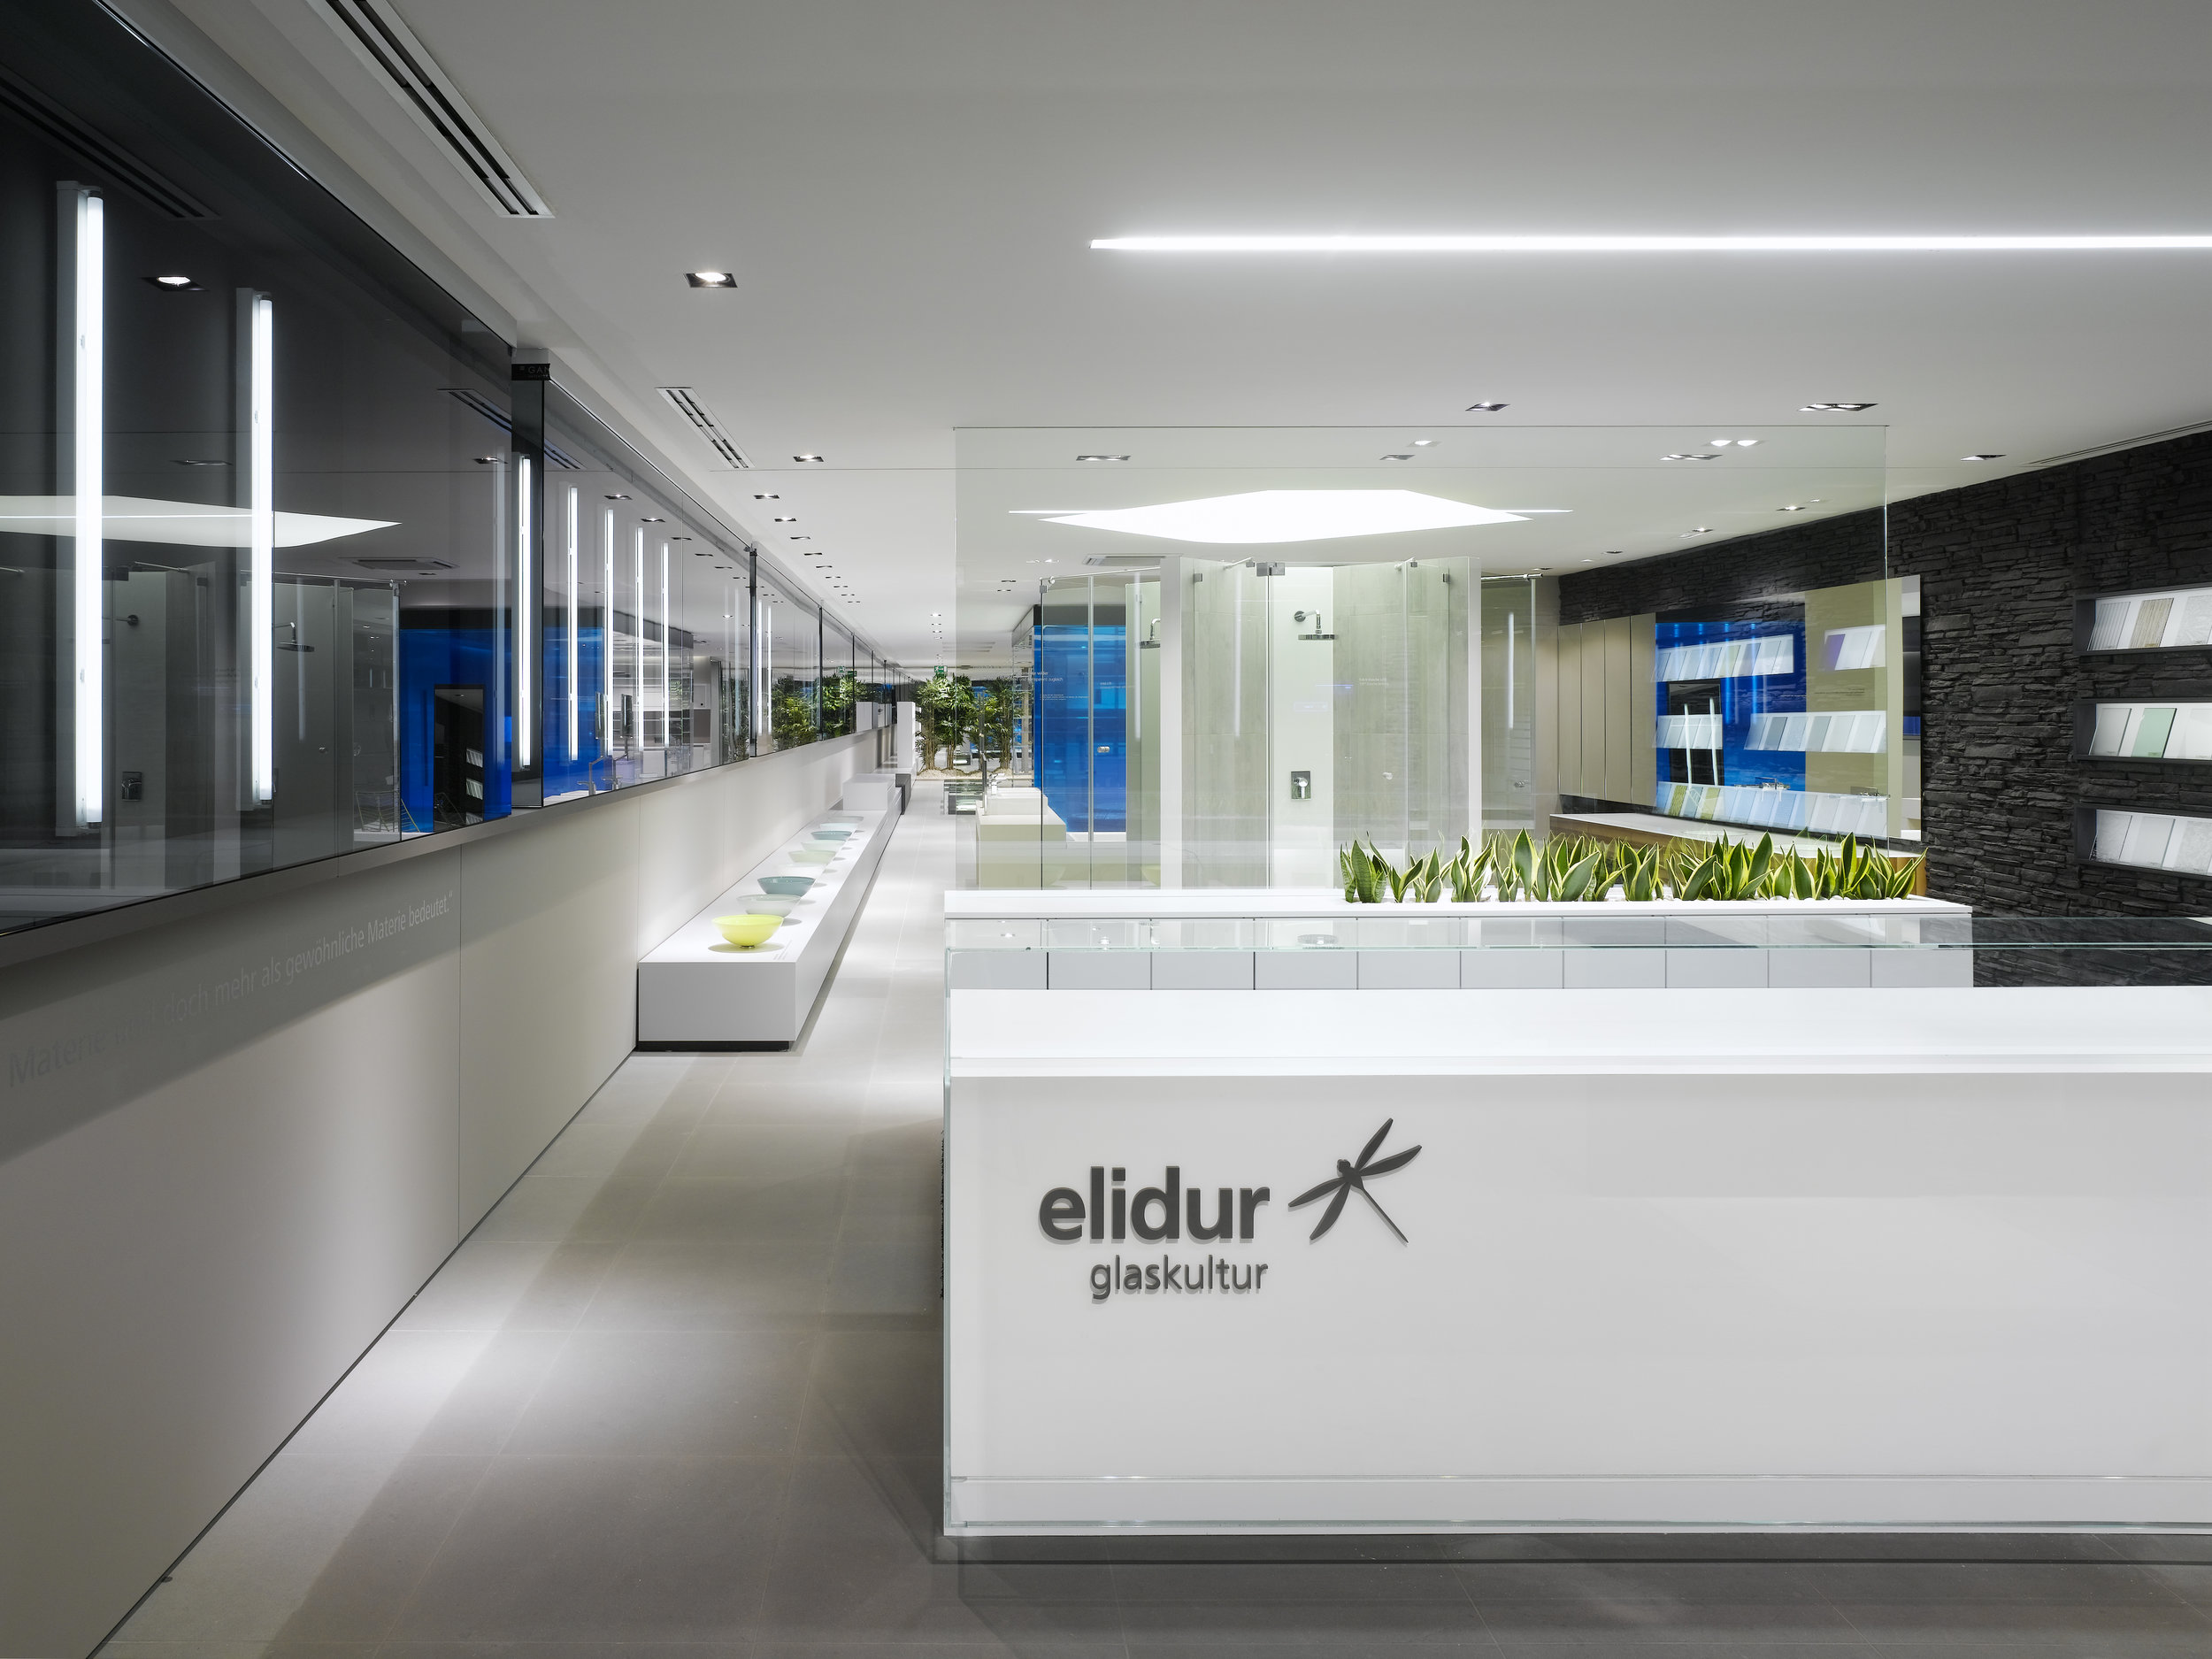 310-39-v_elidur_press.jpg